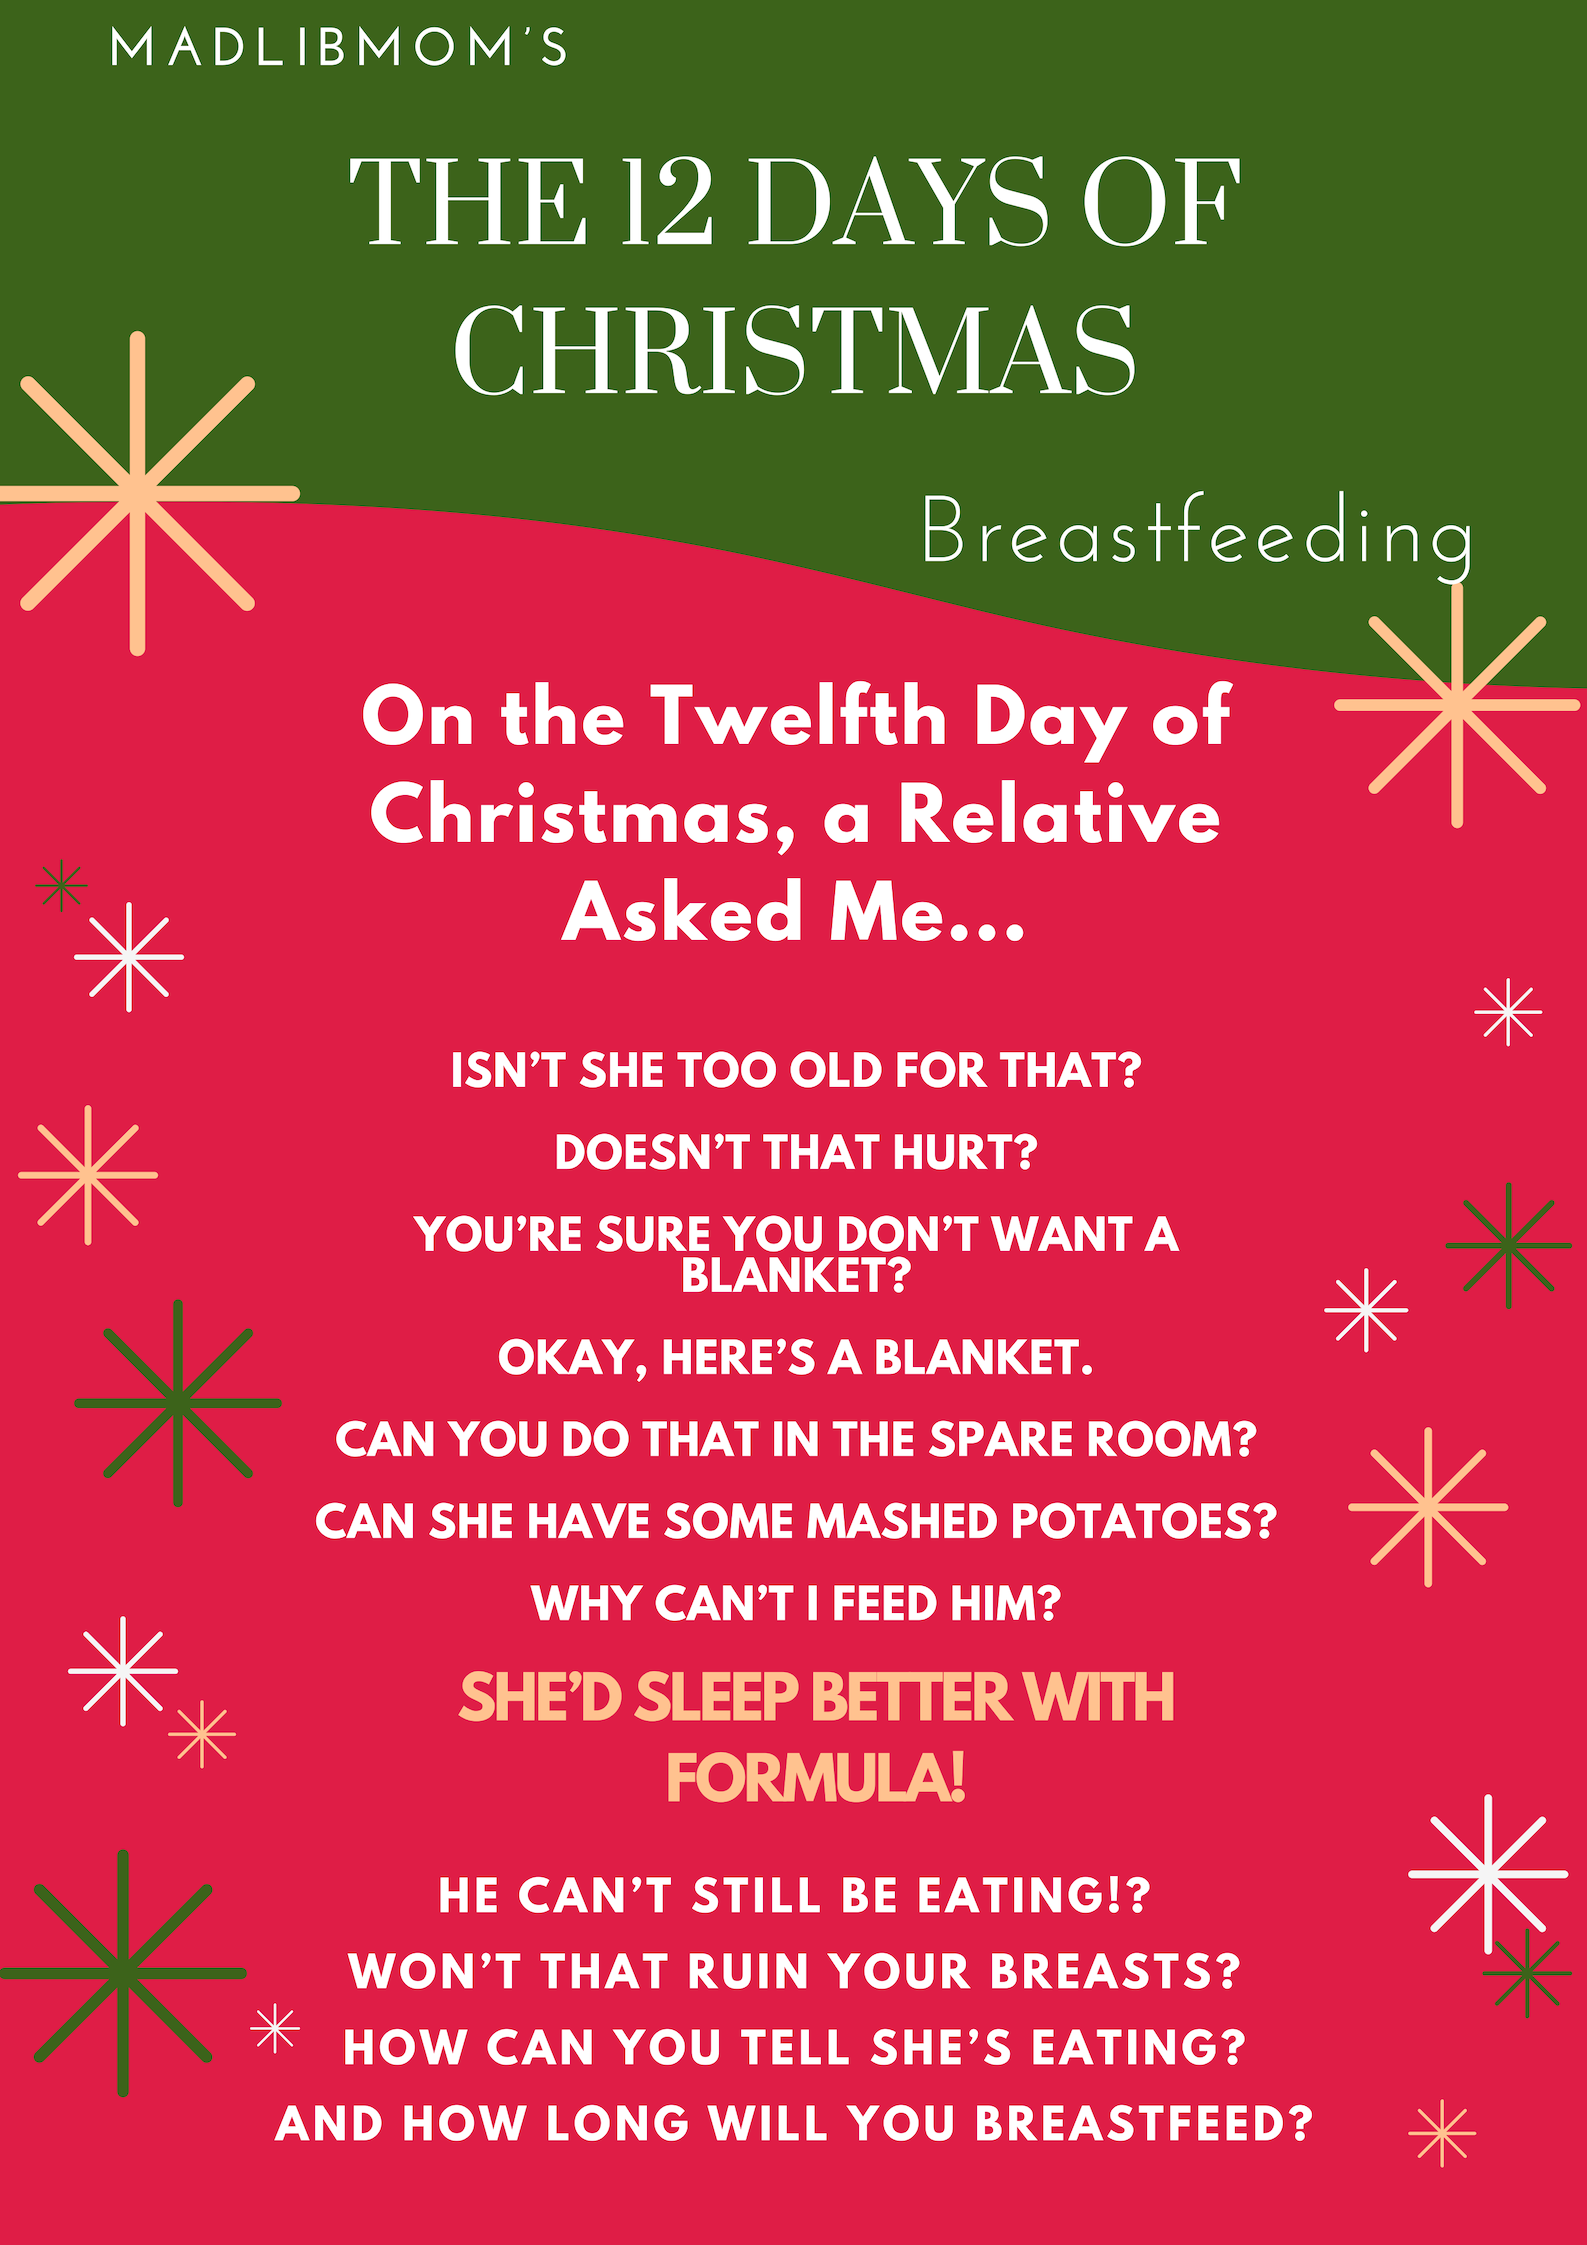 MadLibMom;s The 12 Days Of Christmas